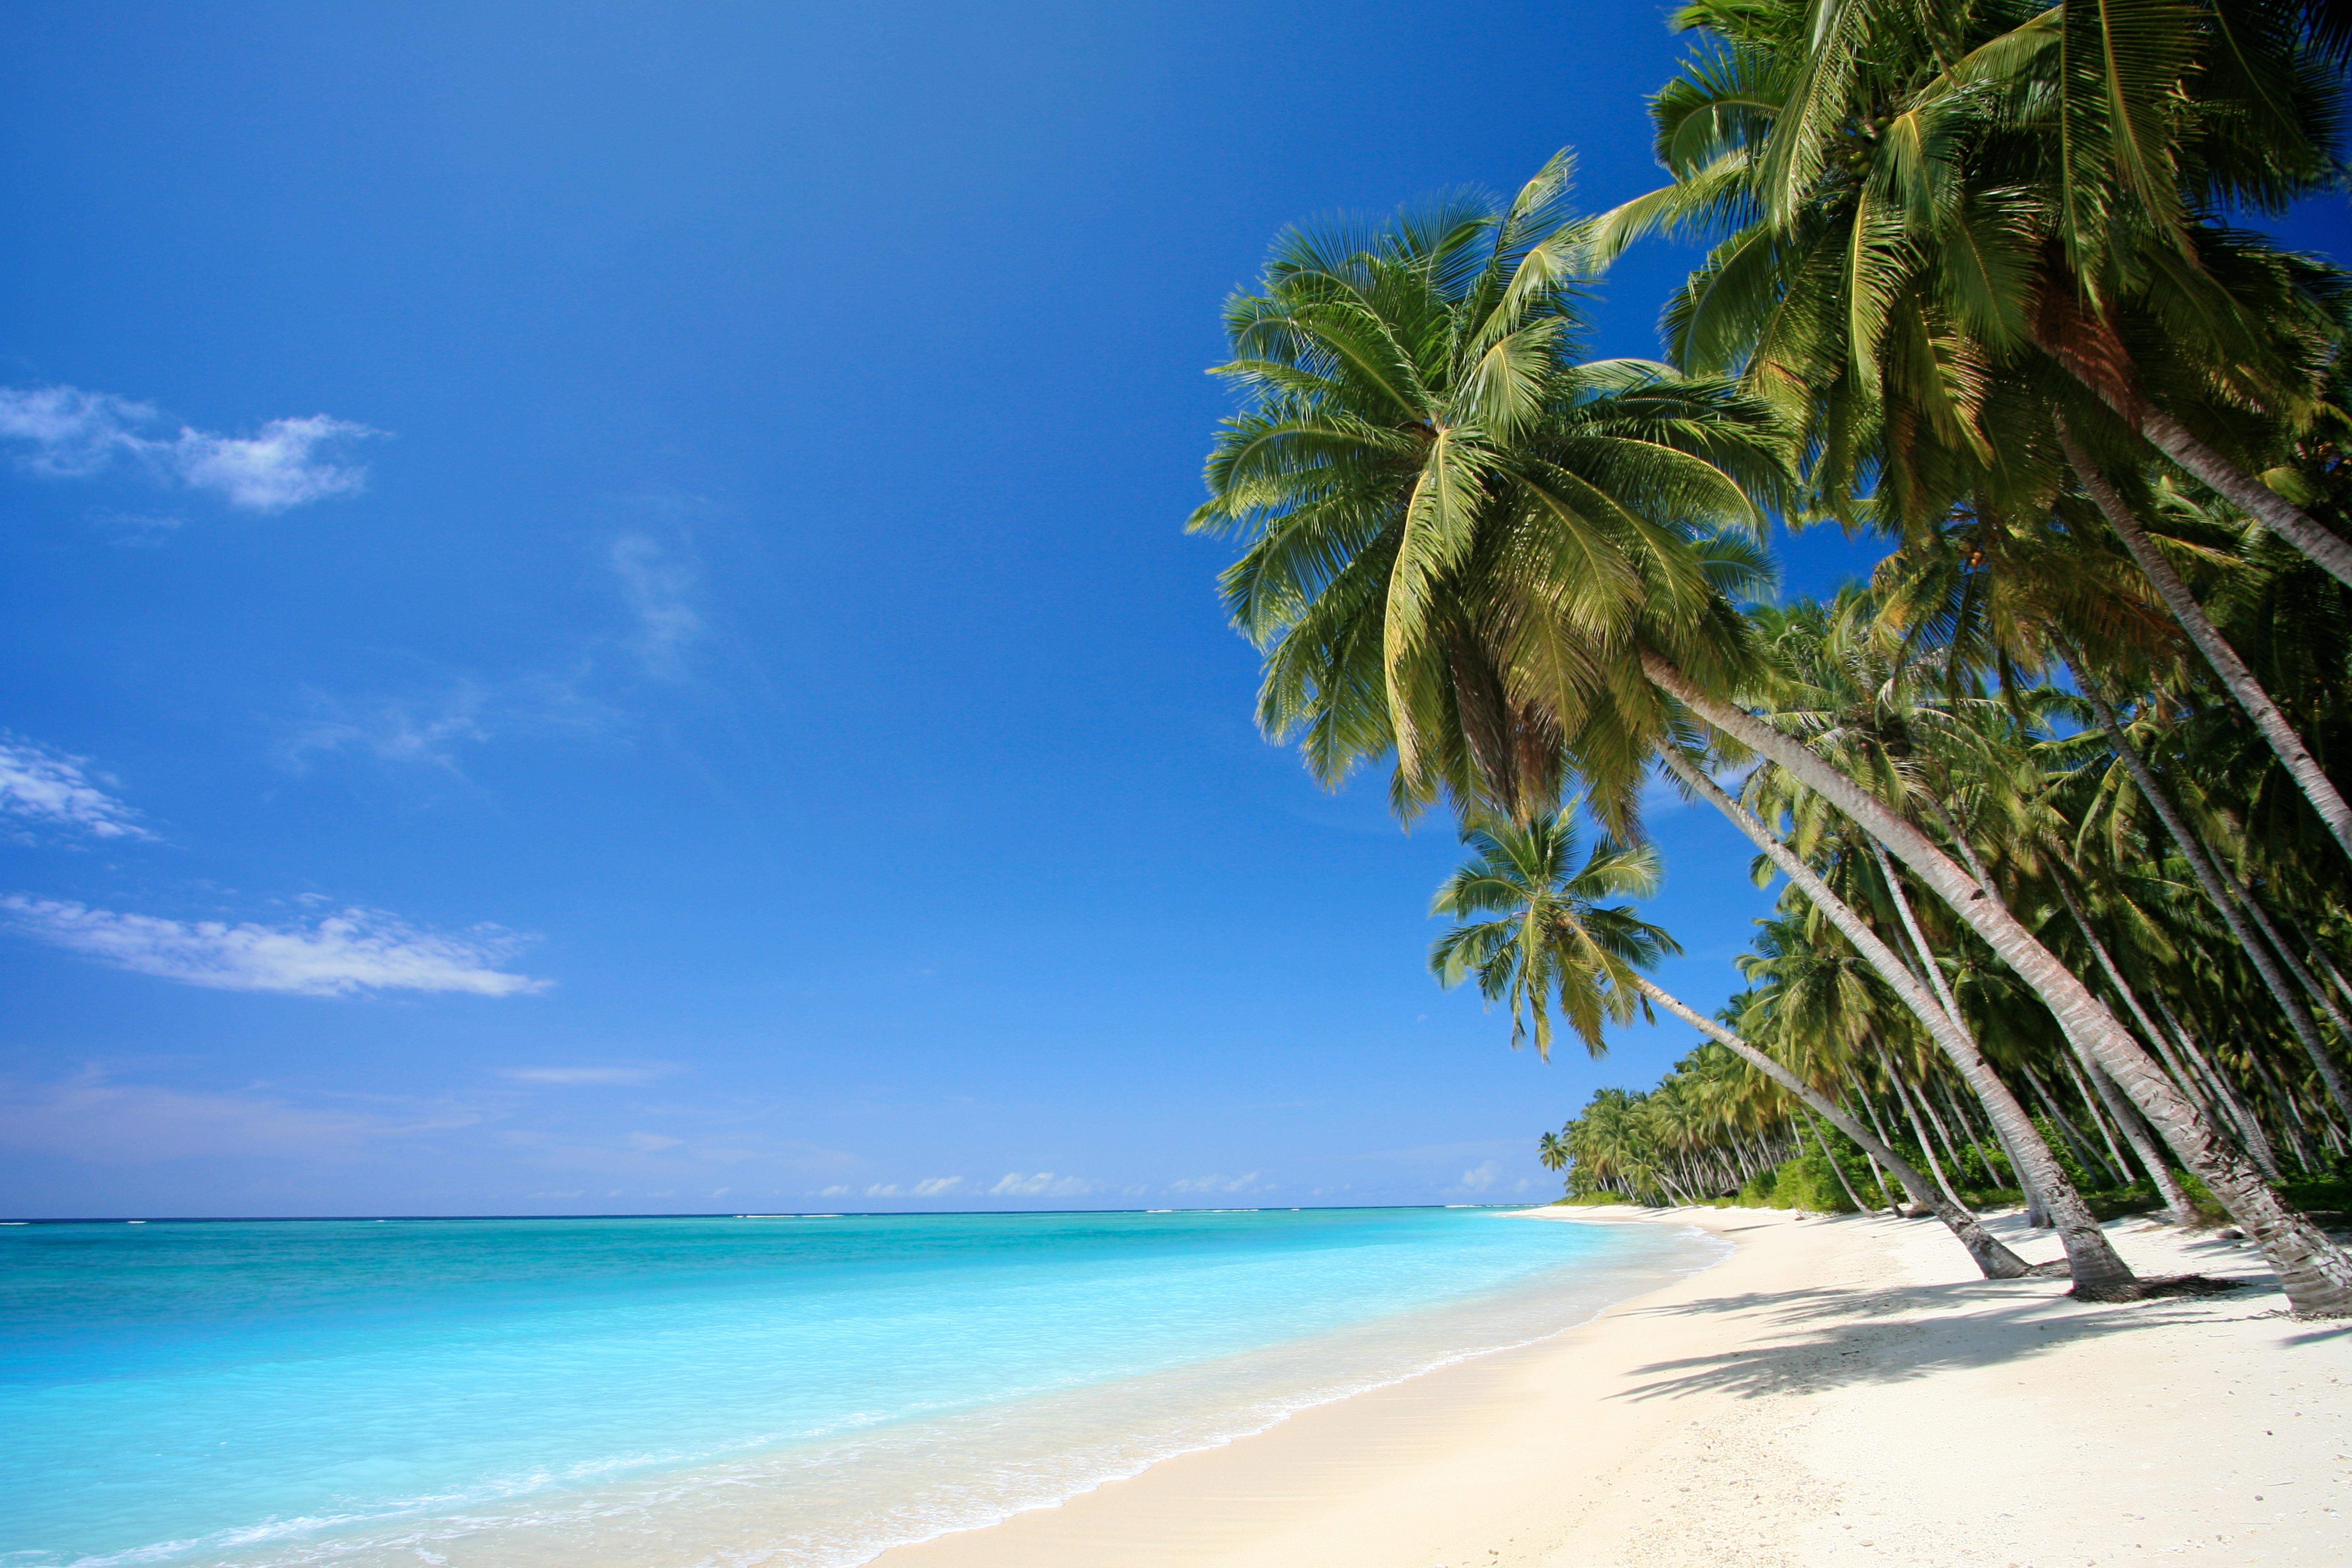 Tropical Beach Screensavers And Wallpaper: Free Tropical Wallpaper